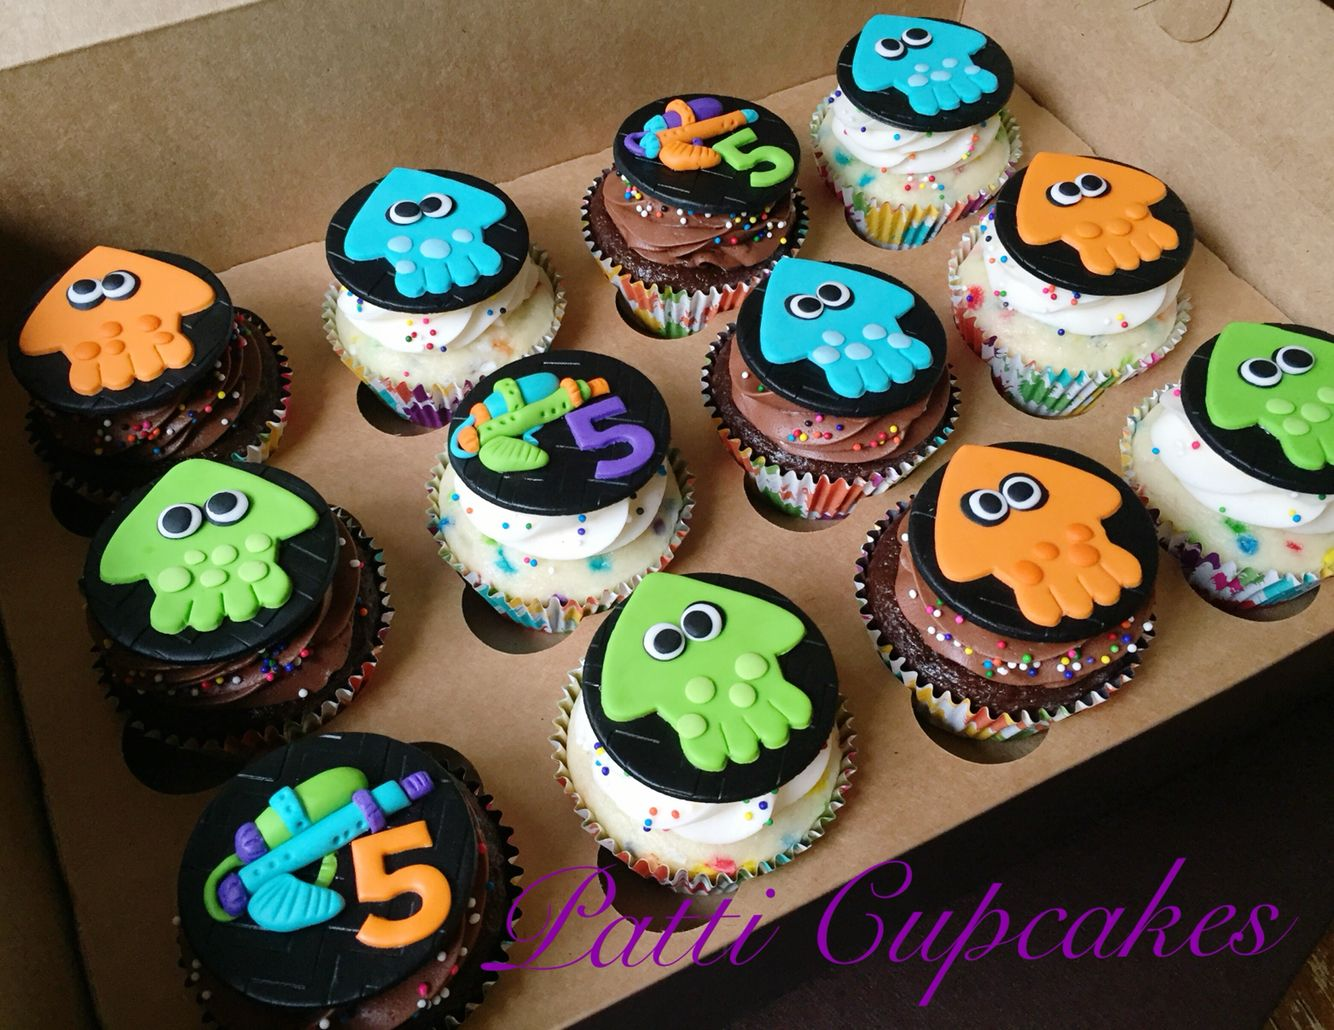 Splatoon Inspired Cupcakes | Geburtstag | Pinterest | Geburtstage